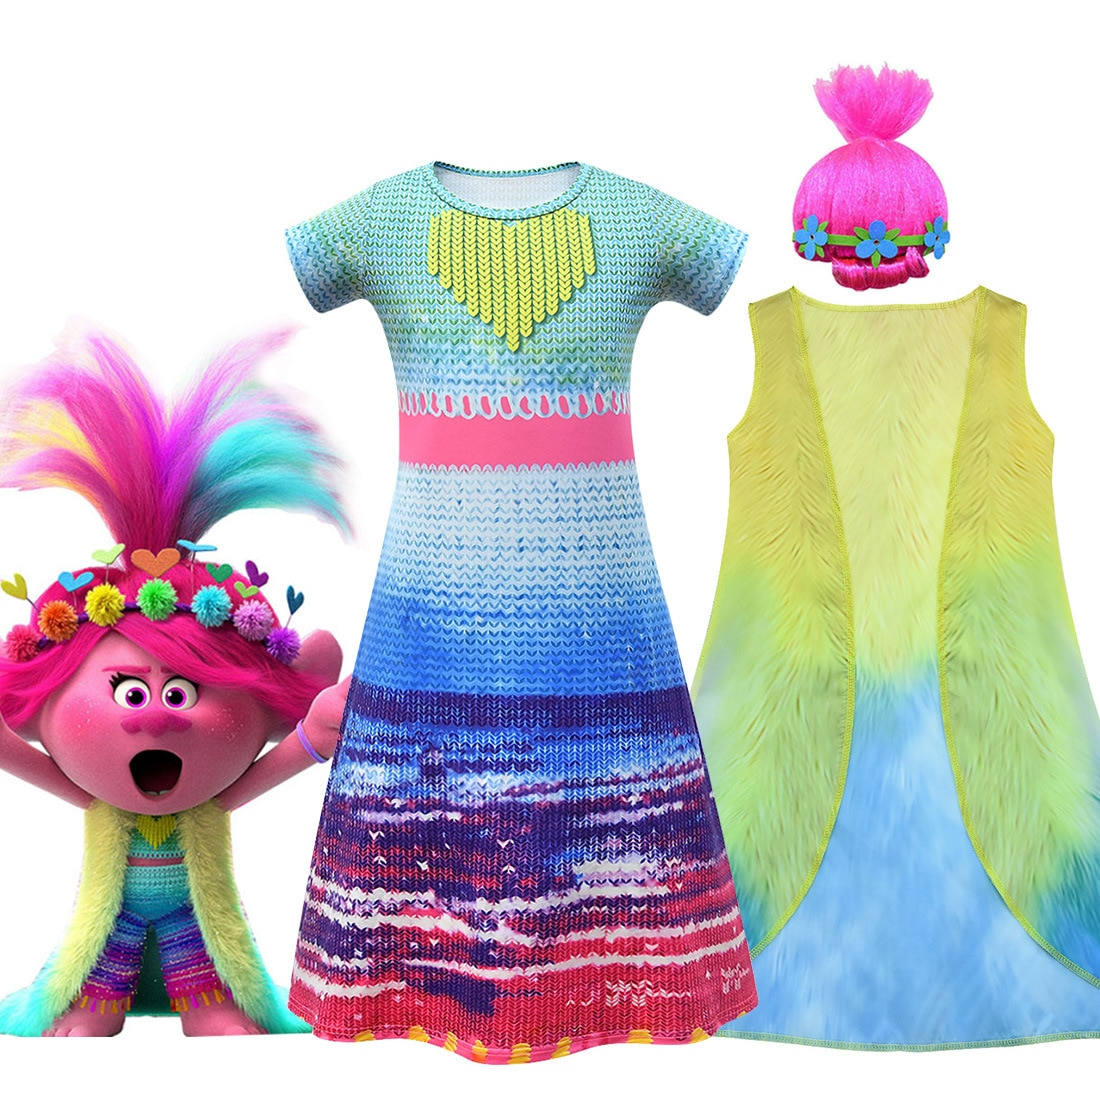 Disfraz de Trolls para niñas, disfraz de actuación de Halloween para niños, vestido, chaleco, juego de pelucas, Trolls para niños, Cosplay de Vocaloid para niñas